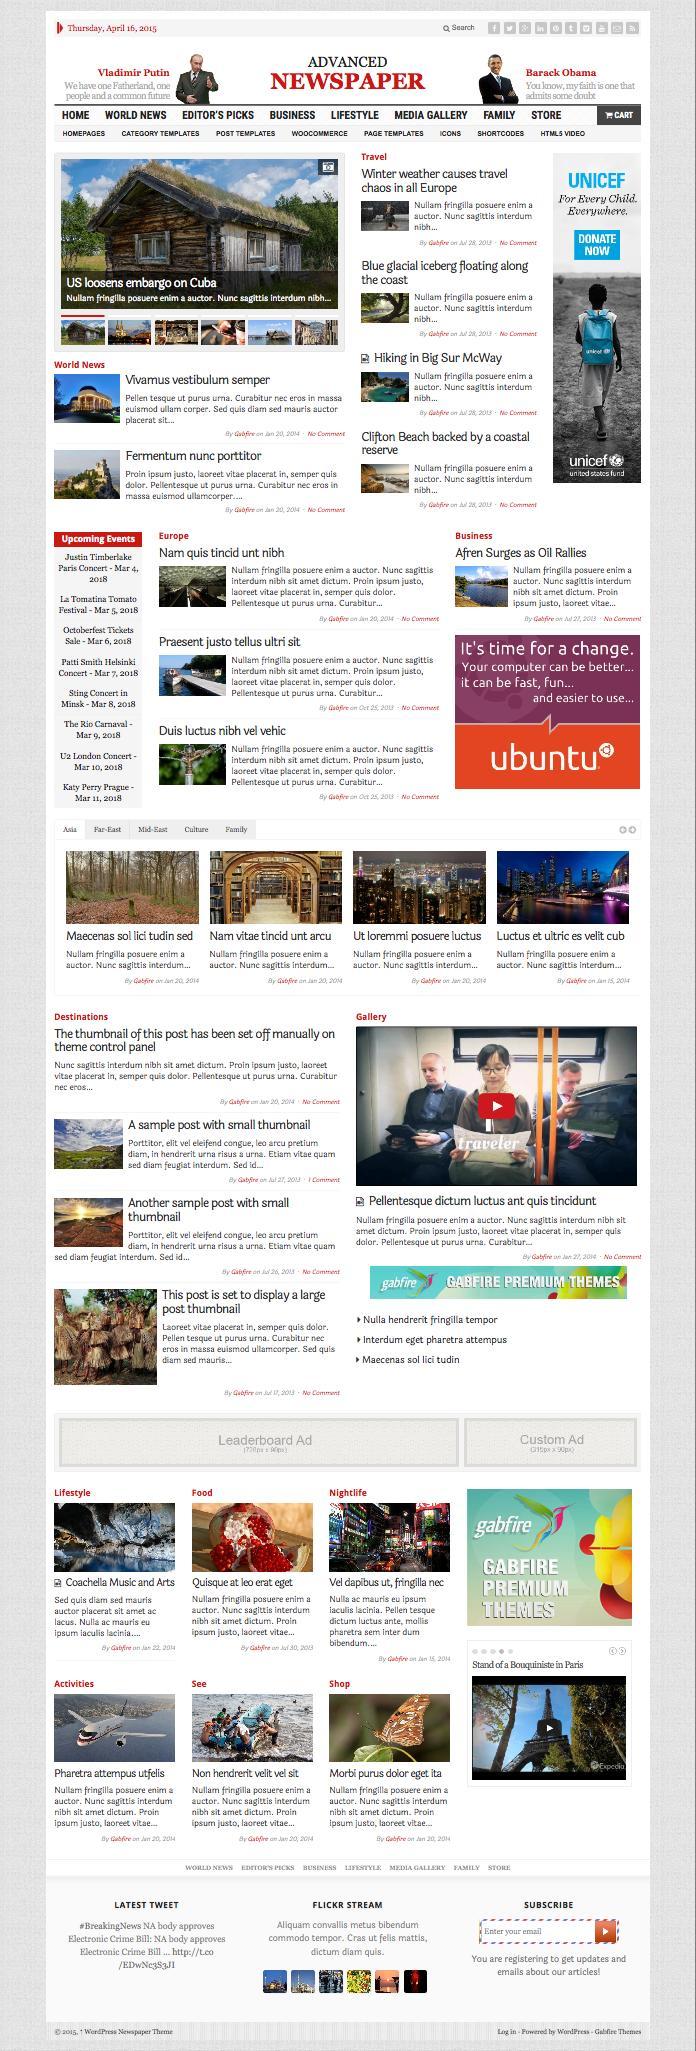 Advanced Newspaper WordPress Theme